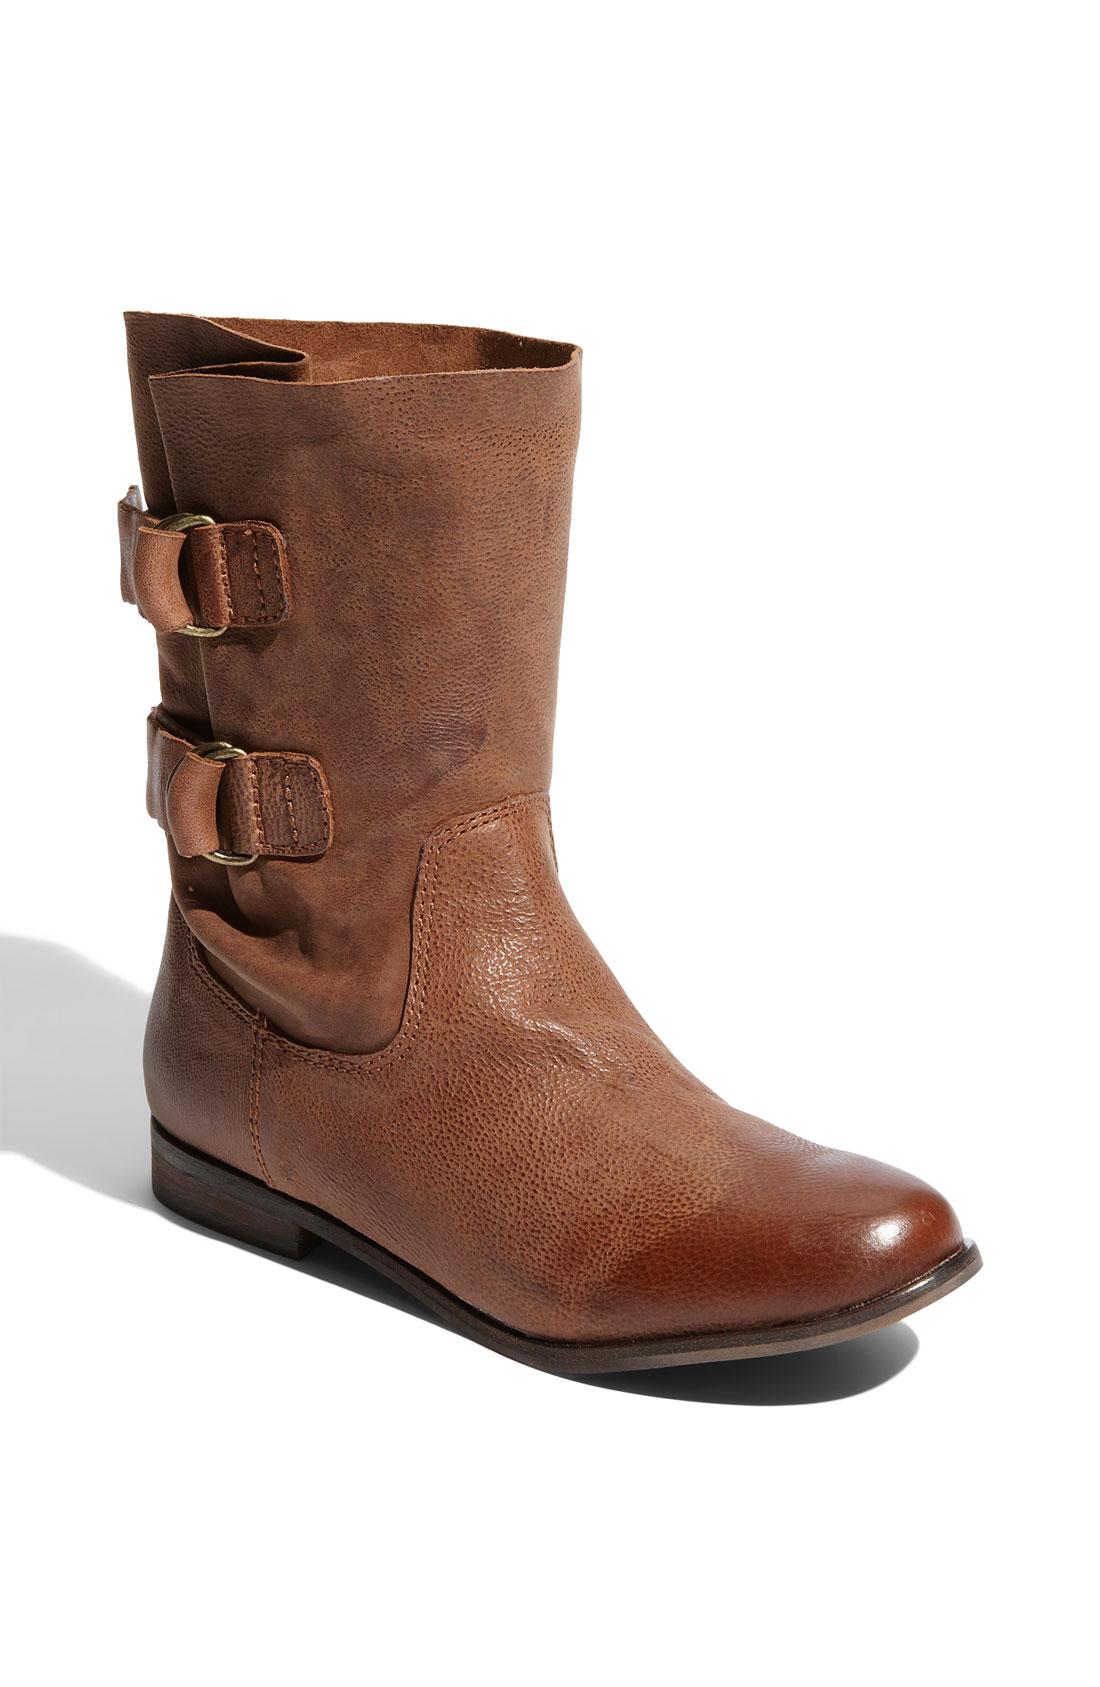 steven by steve madden gaven ankle boot in brown cognac